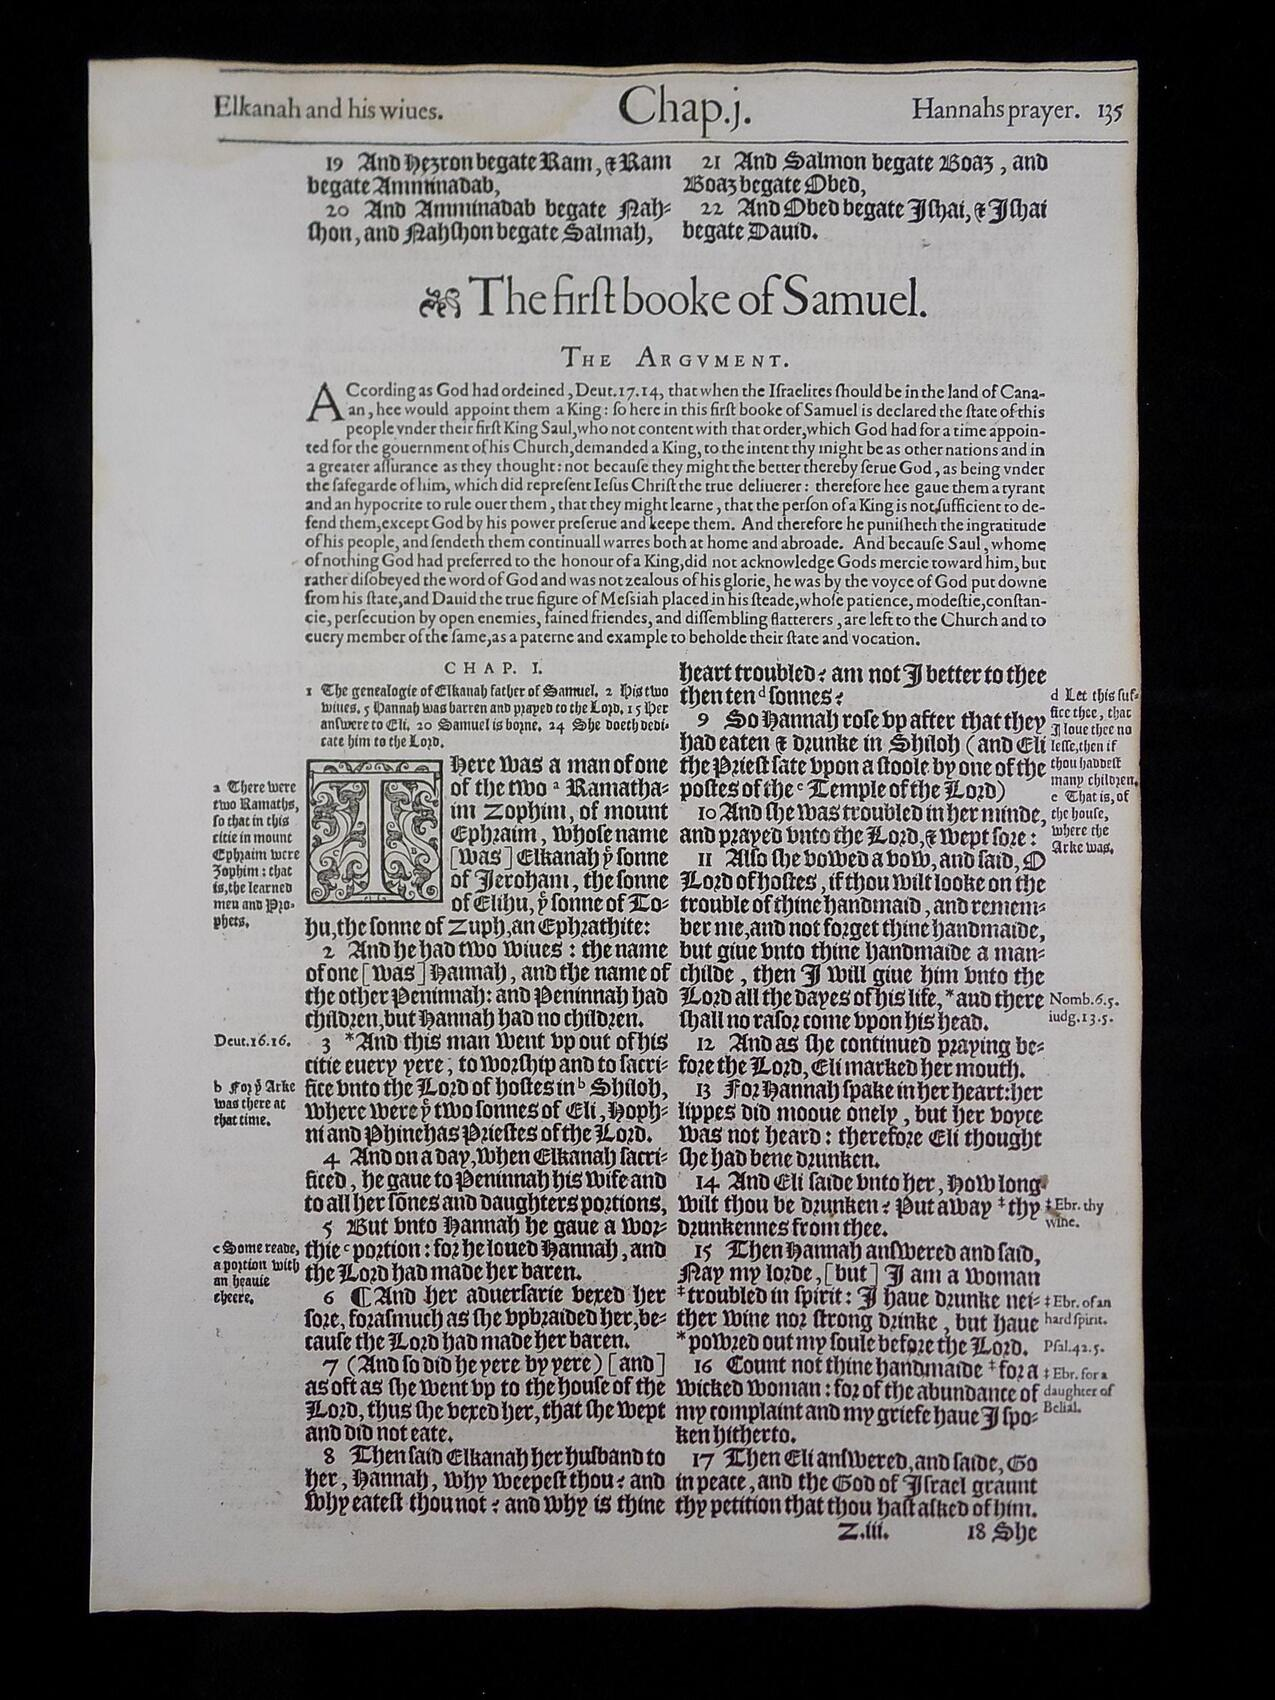 1583 NOBLEST GENEVA BIBLE LEAVES BOOK OF FIRST SAMUEL